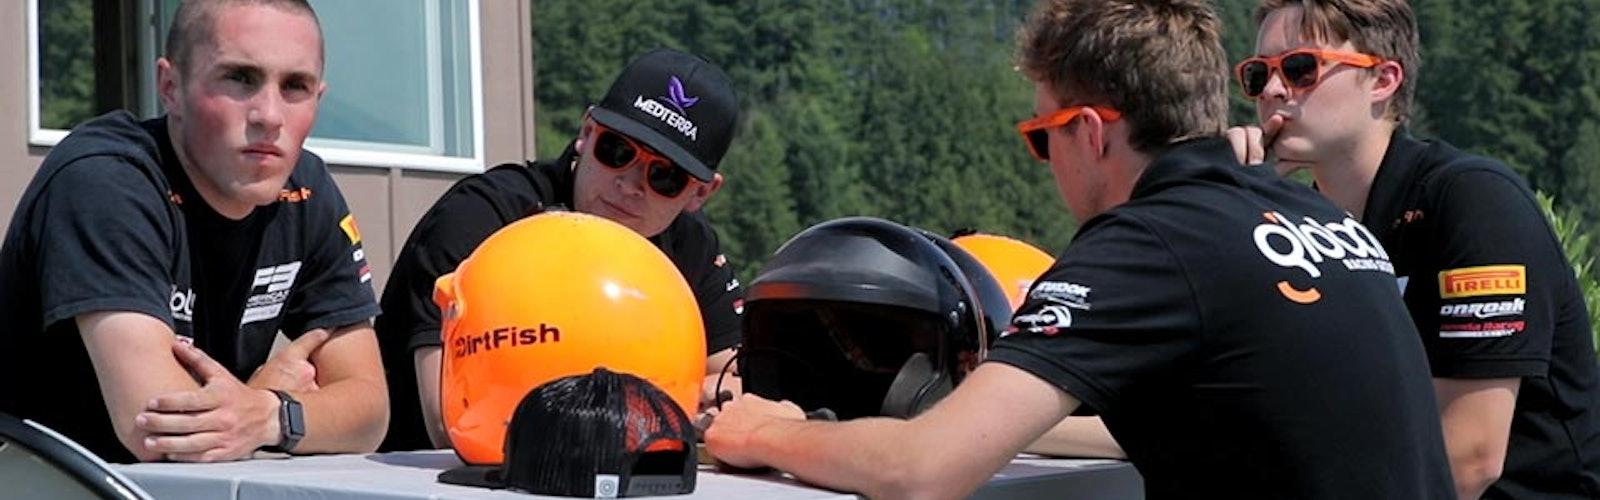 Formula-Car-Team-Cross-Trains-at-a-Rally-School-1